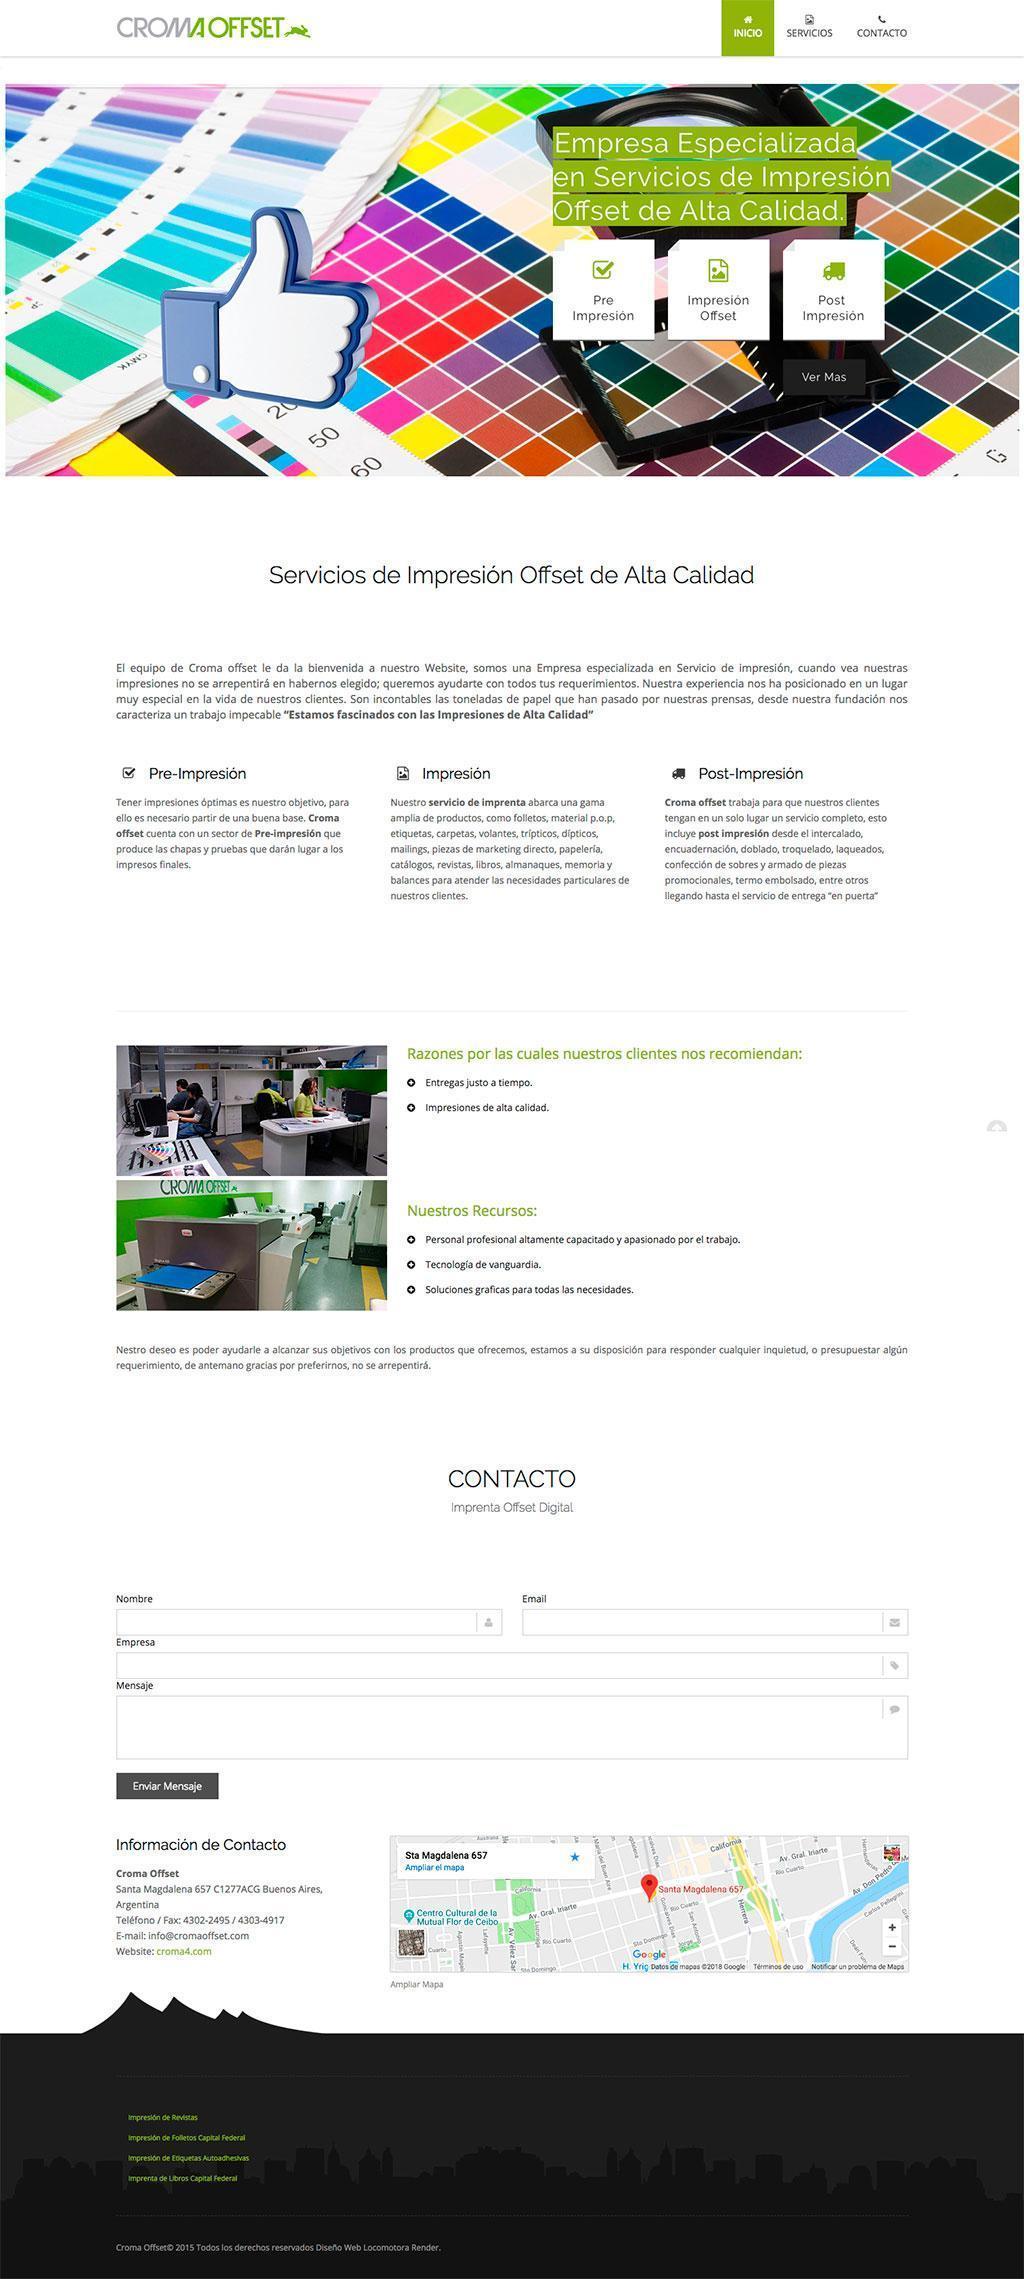 diseño sitio web imprenta croma offset